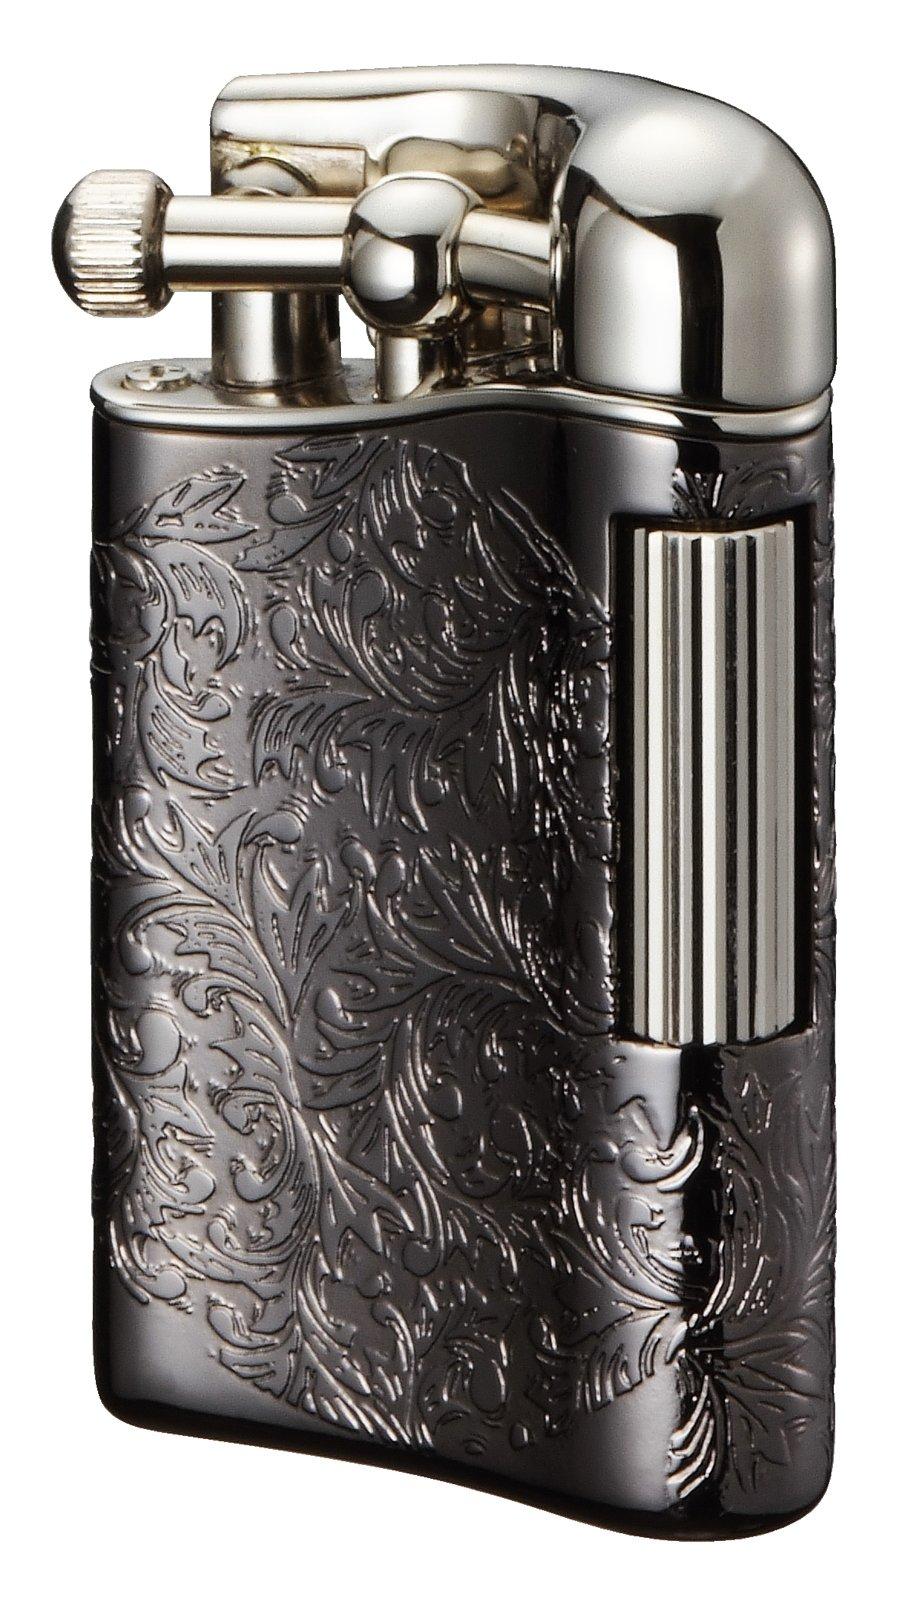 Sarome Flint Lighter for Pipe PSD12-28 Antique black arabesque / Silver